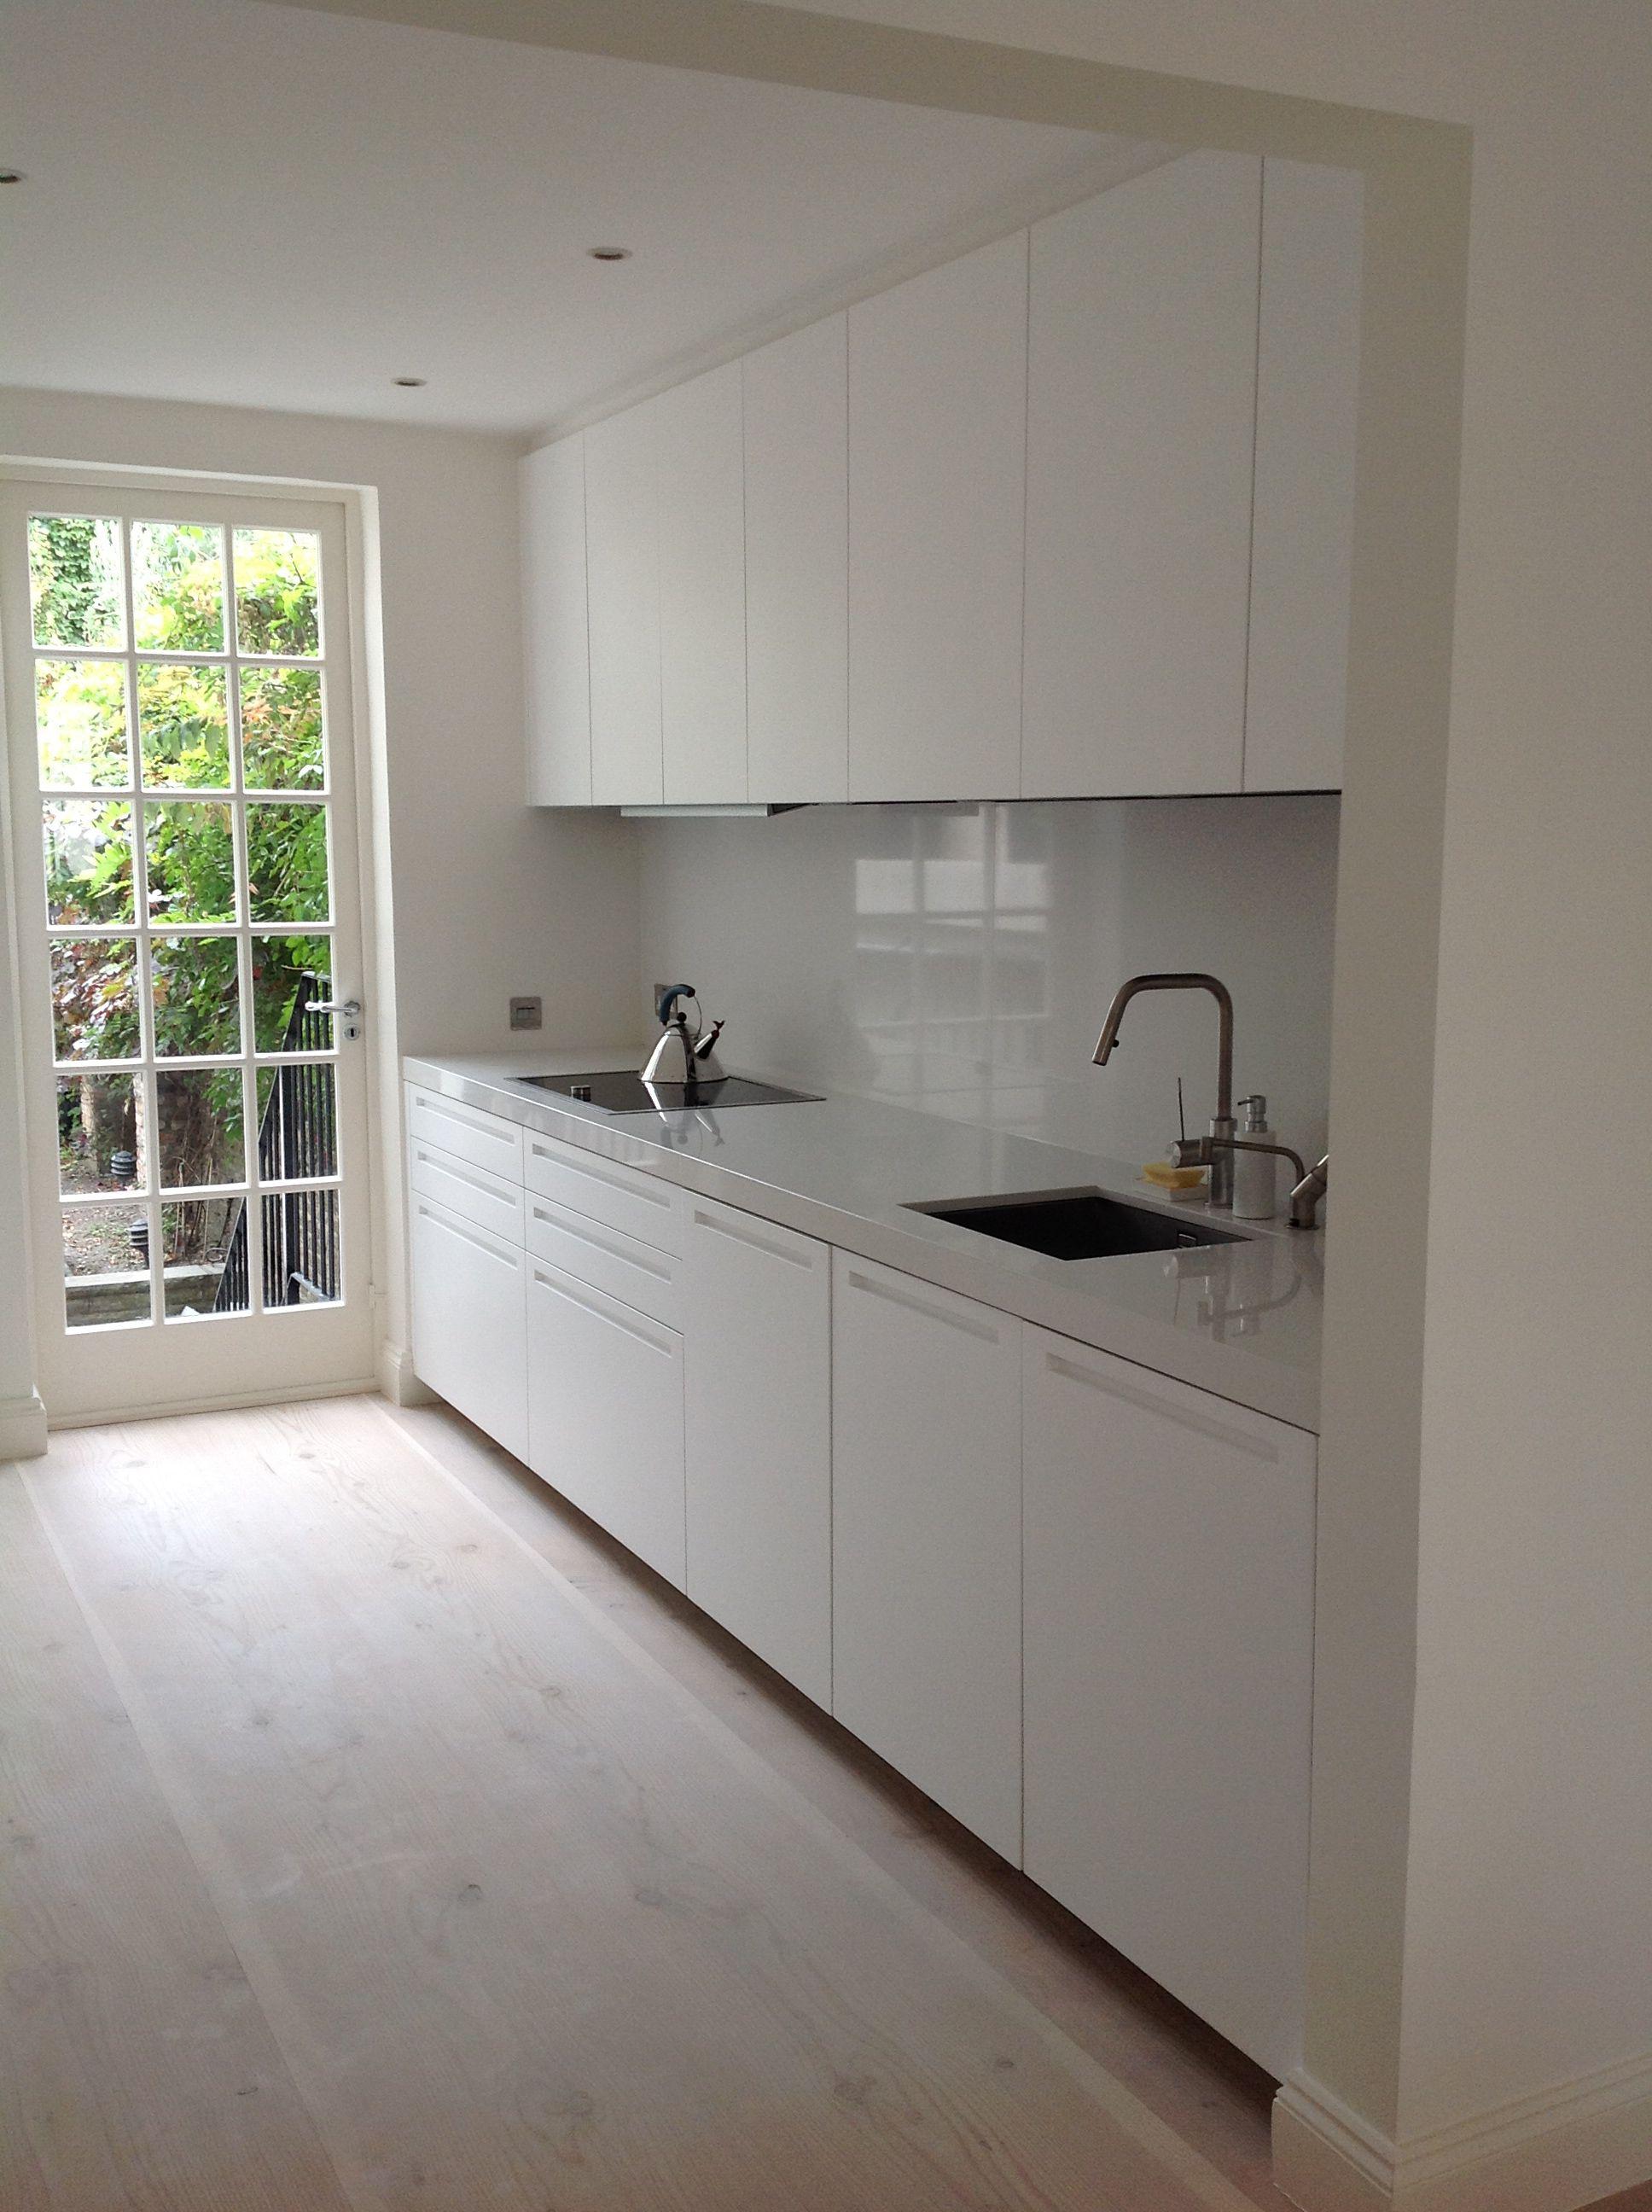 White/Boffi/LT Cocinas, Proyectos